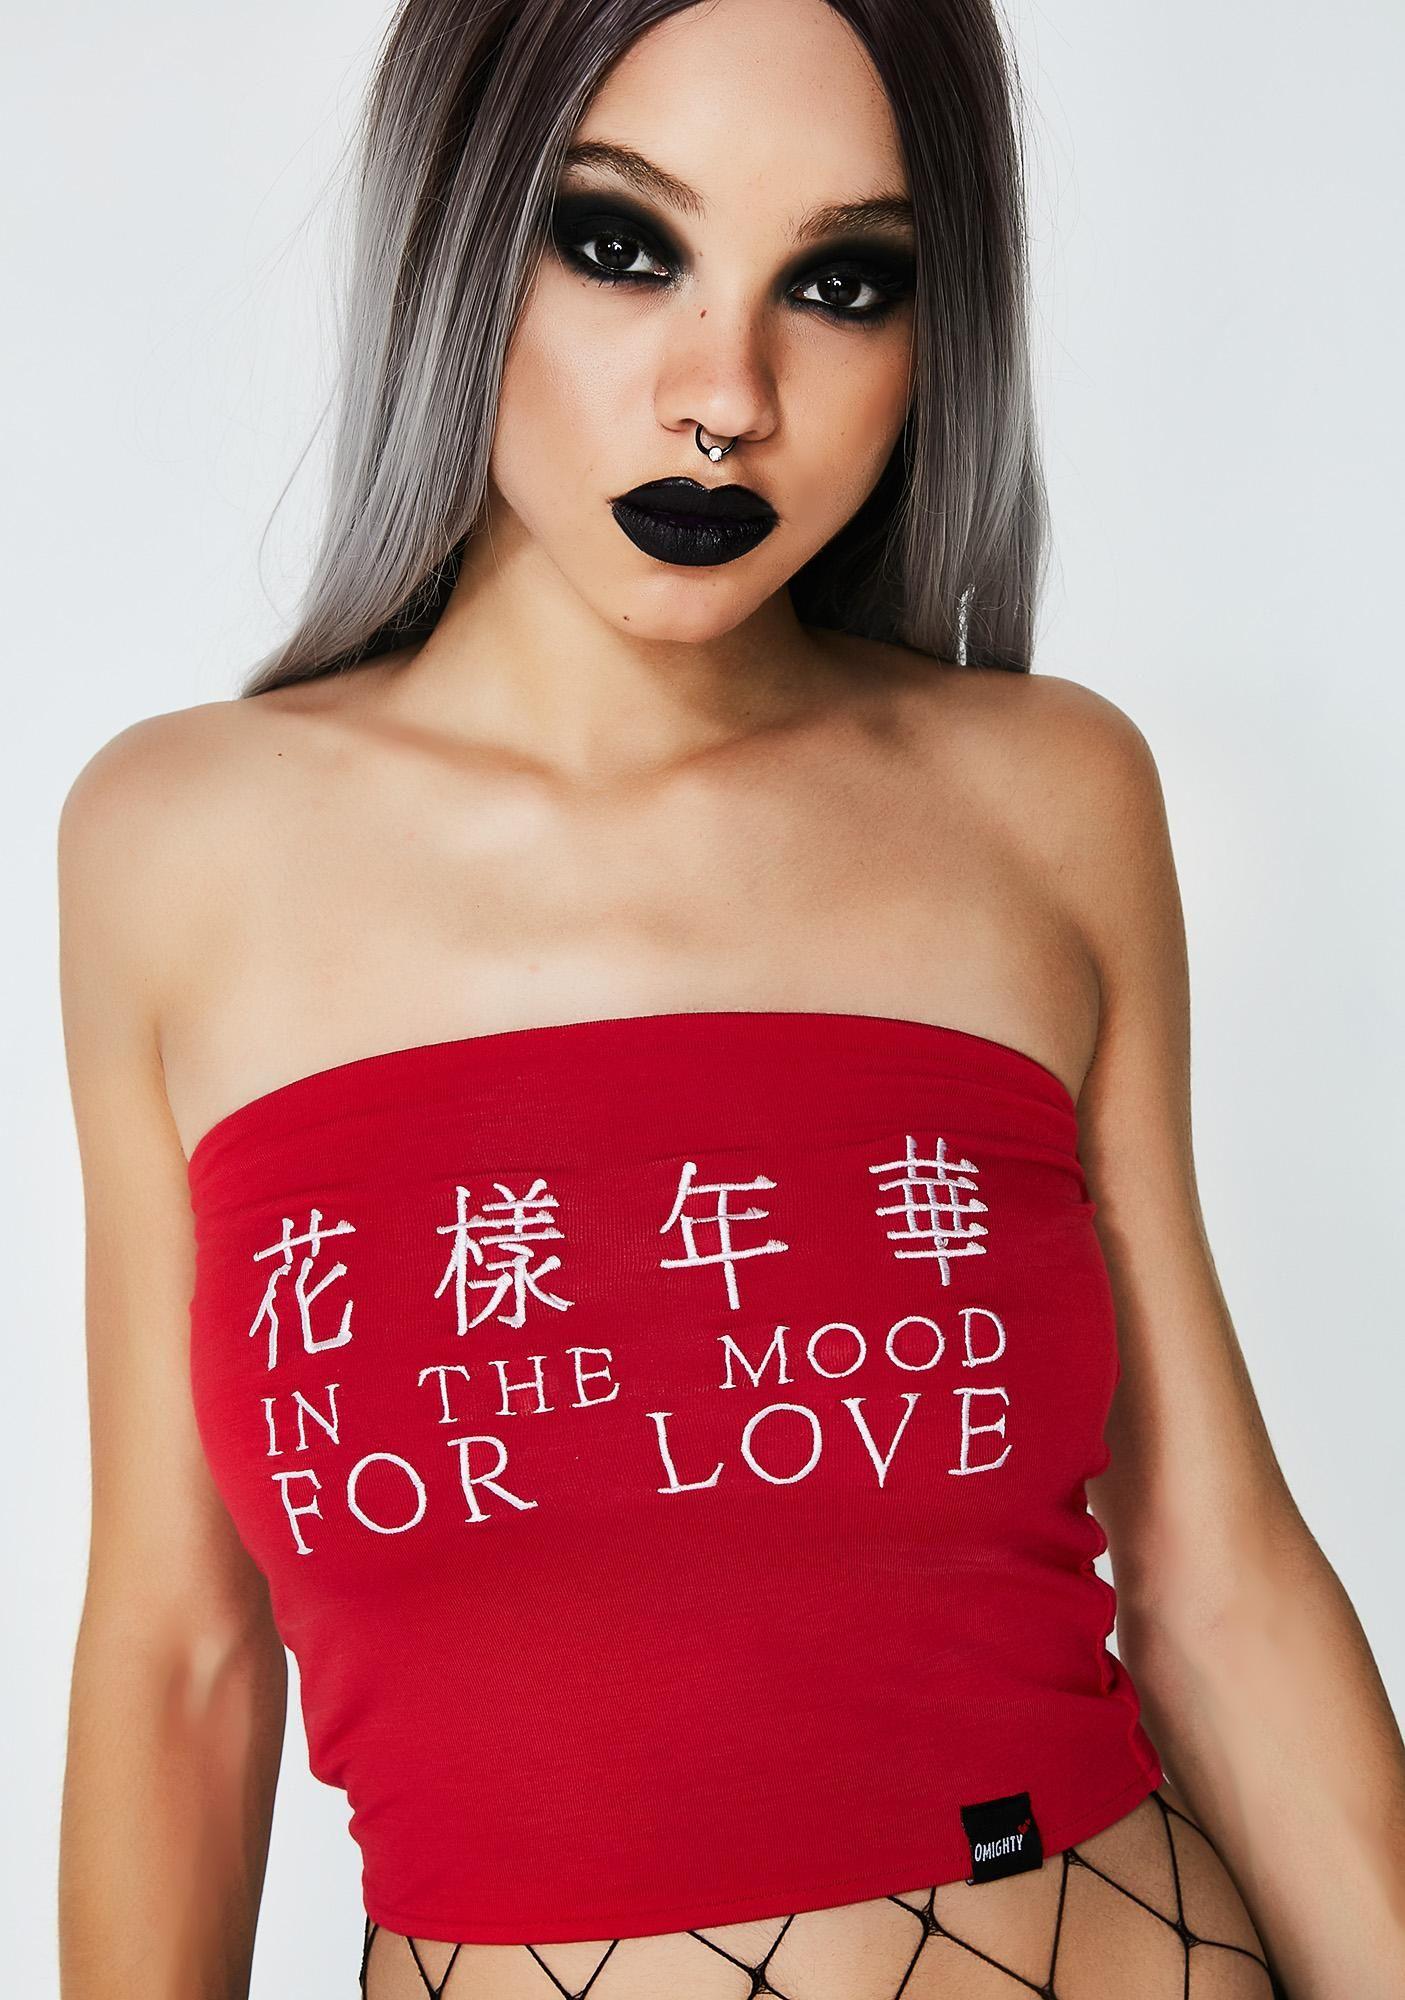 those boob love